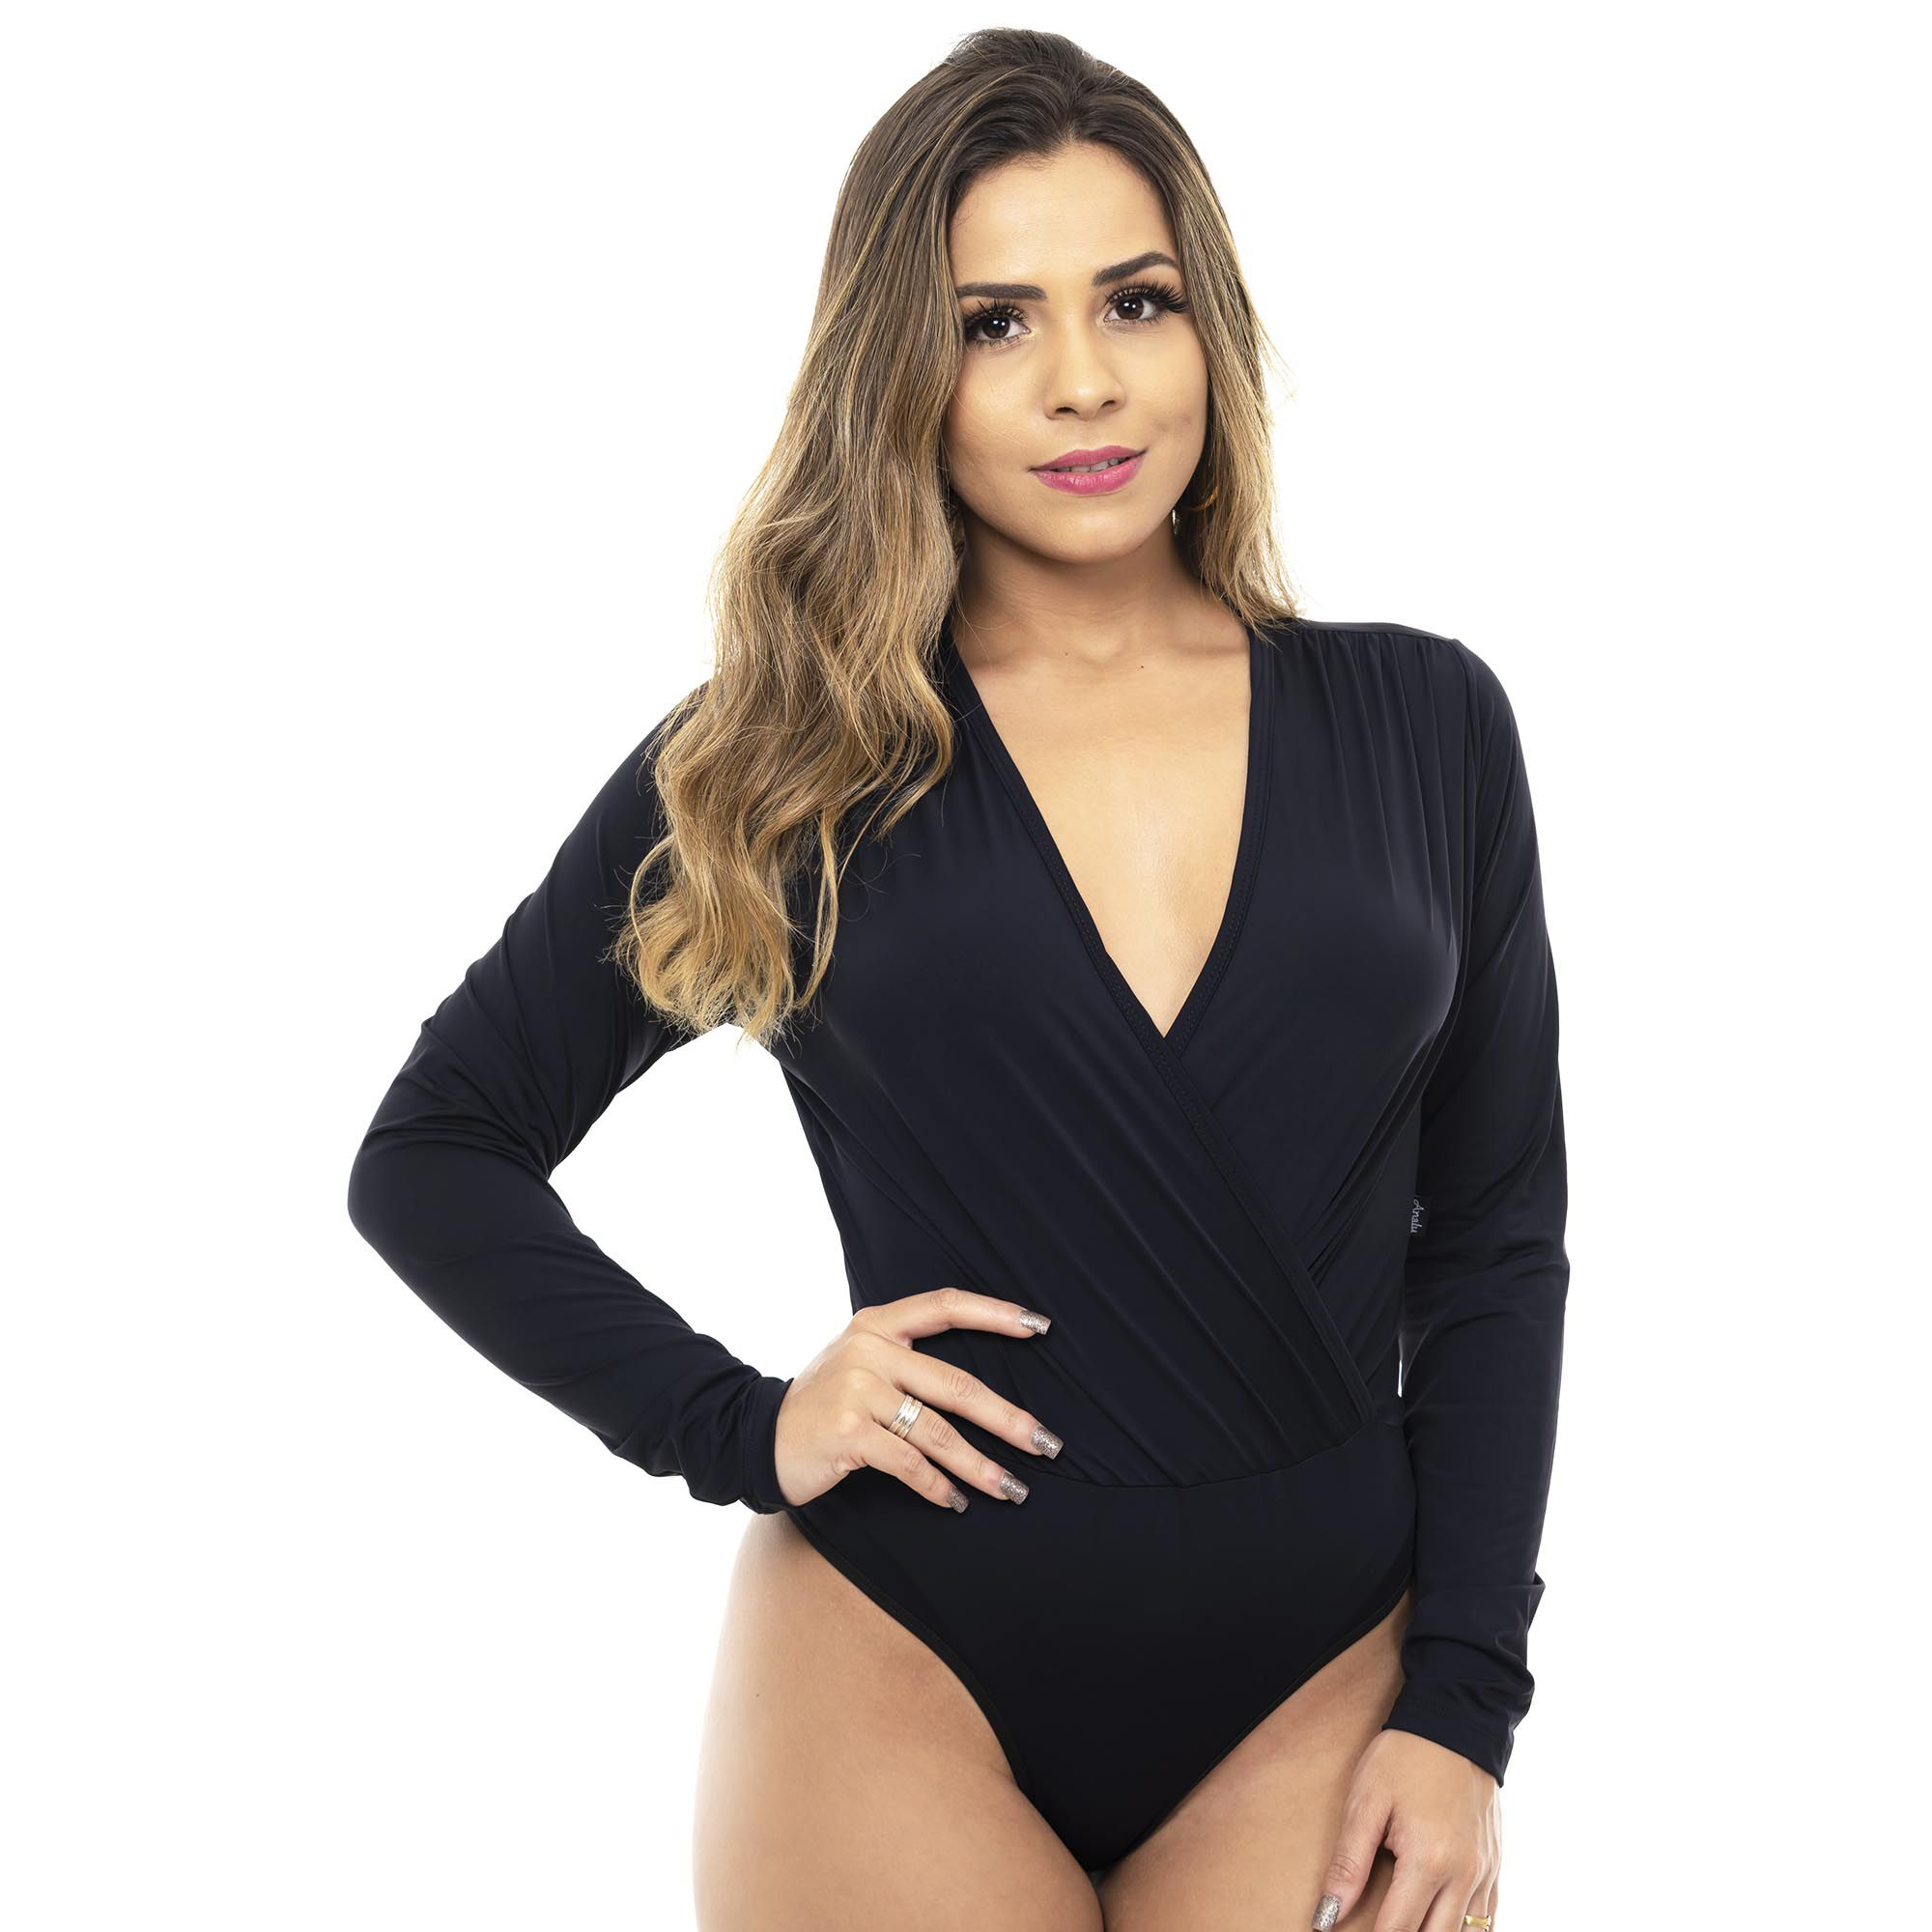 Marca Analu - Página 2 - Busca na Analu Moda Feminina 855309003d9